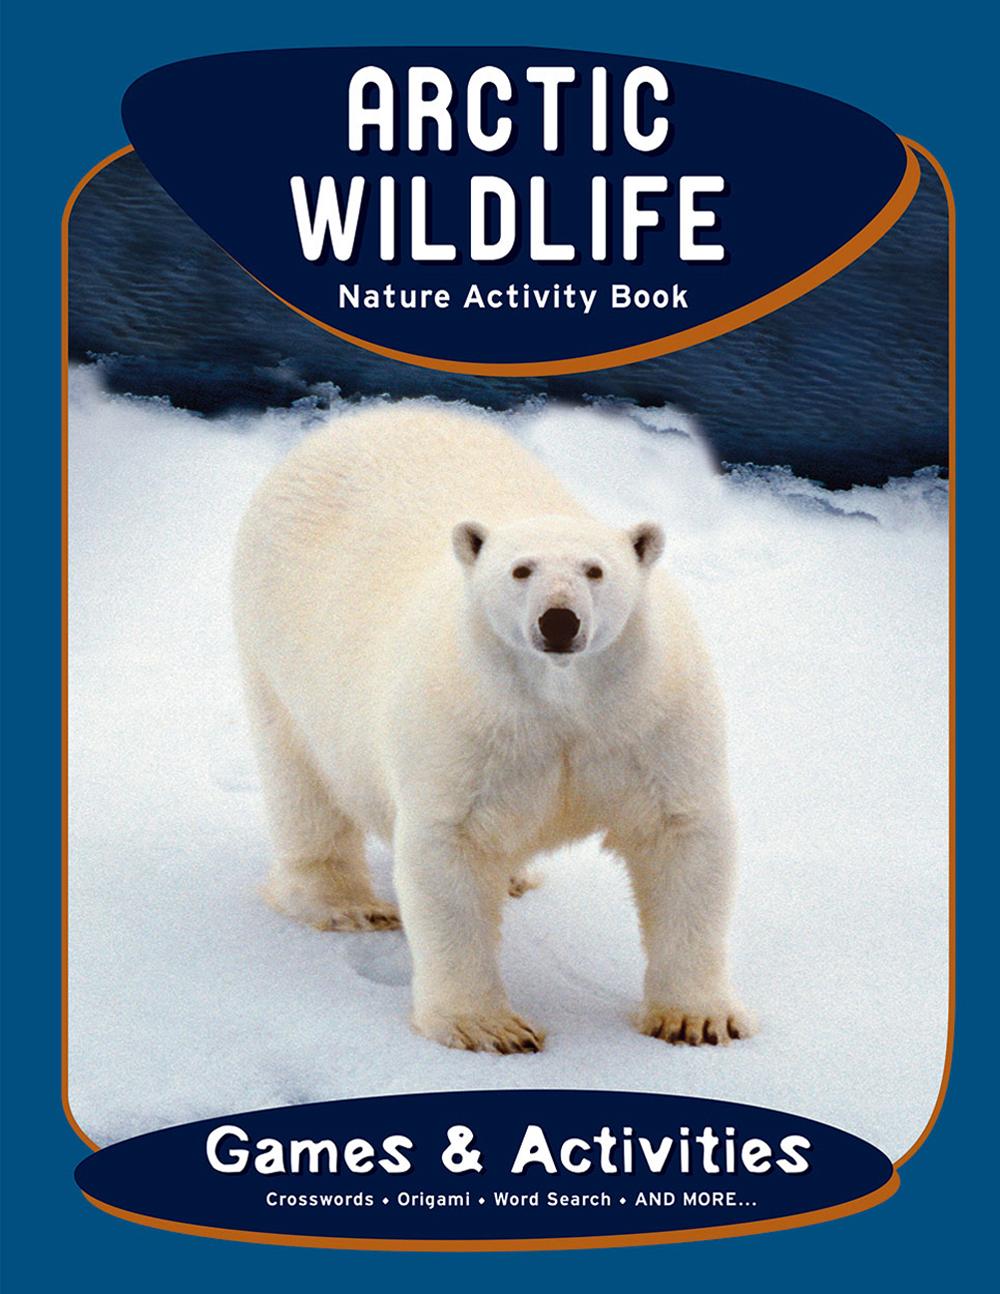 Arctic Wildlife Nature Activity Book